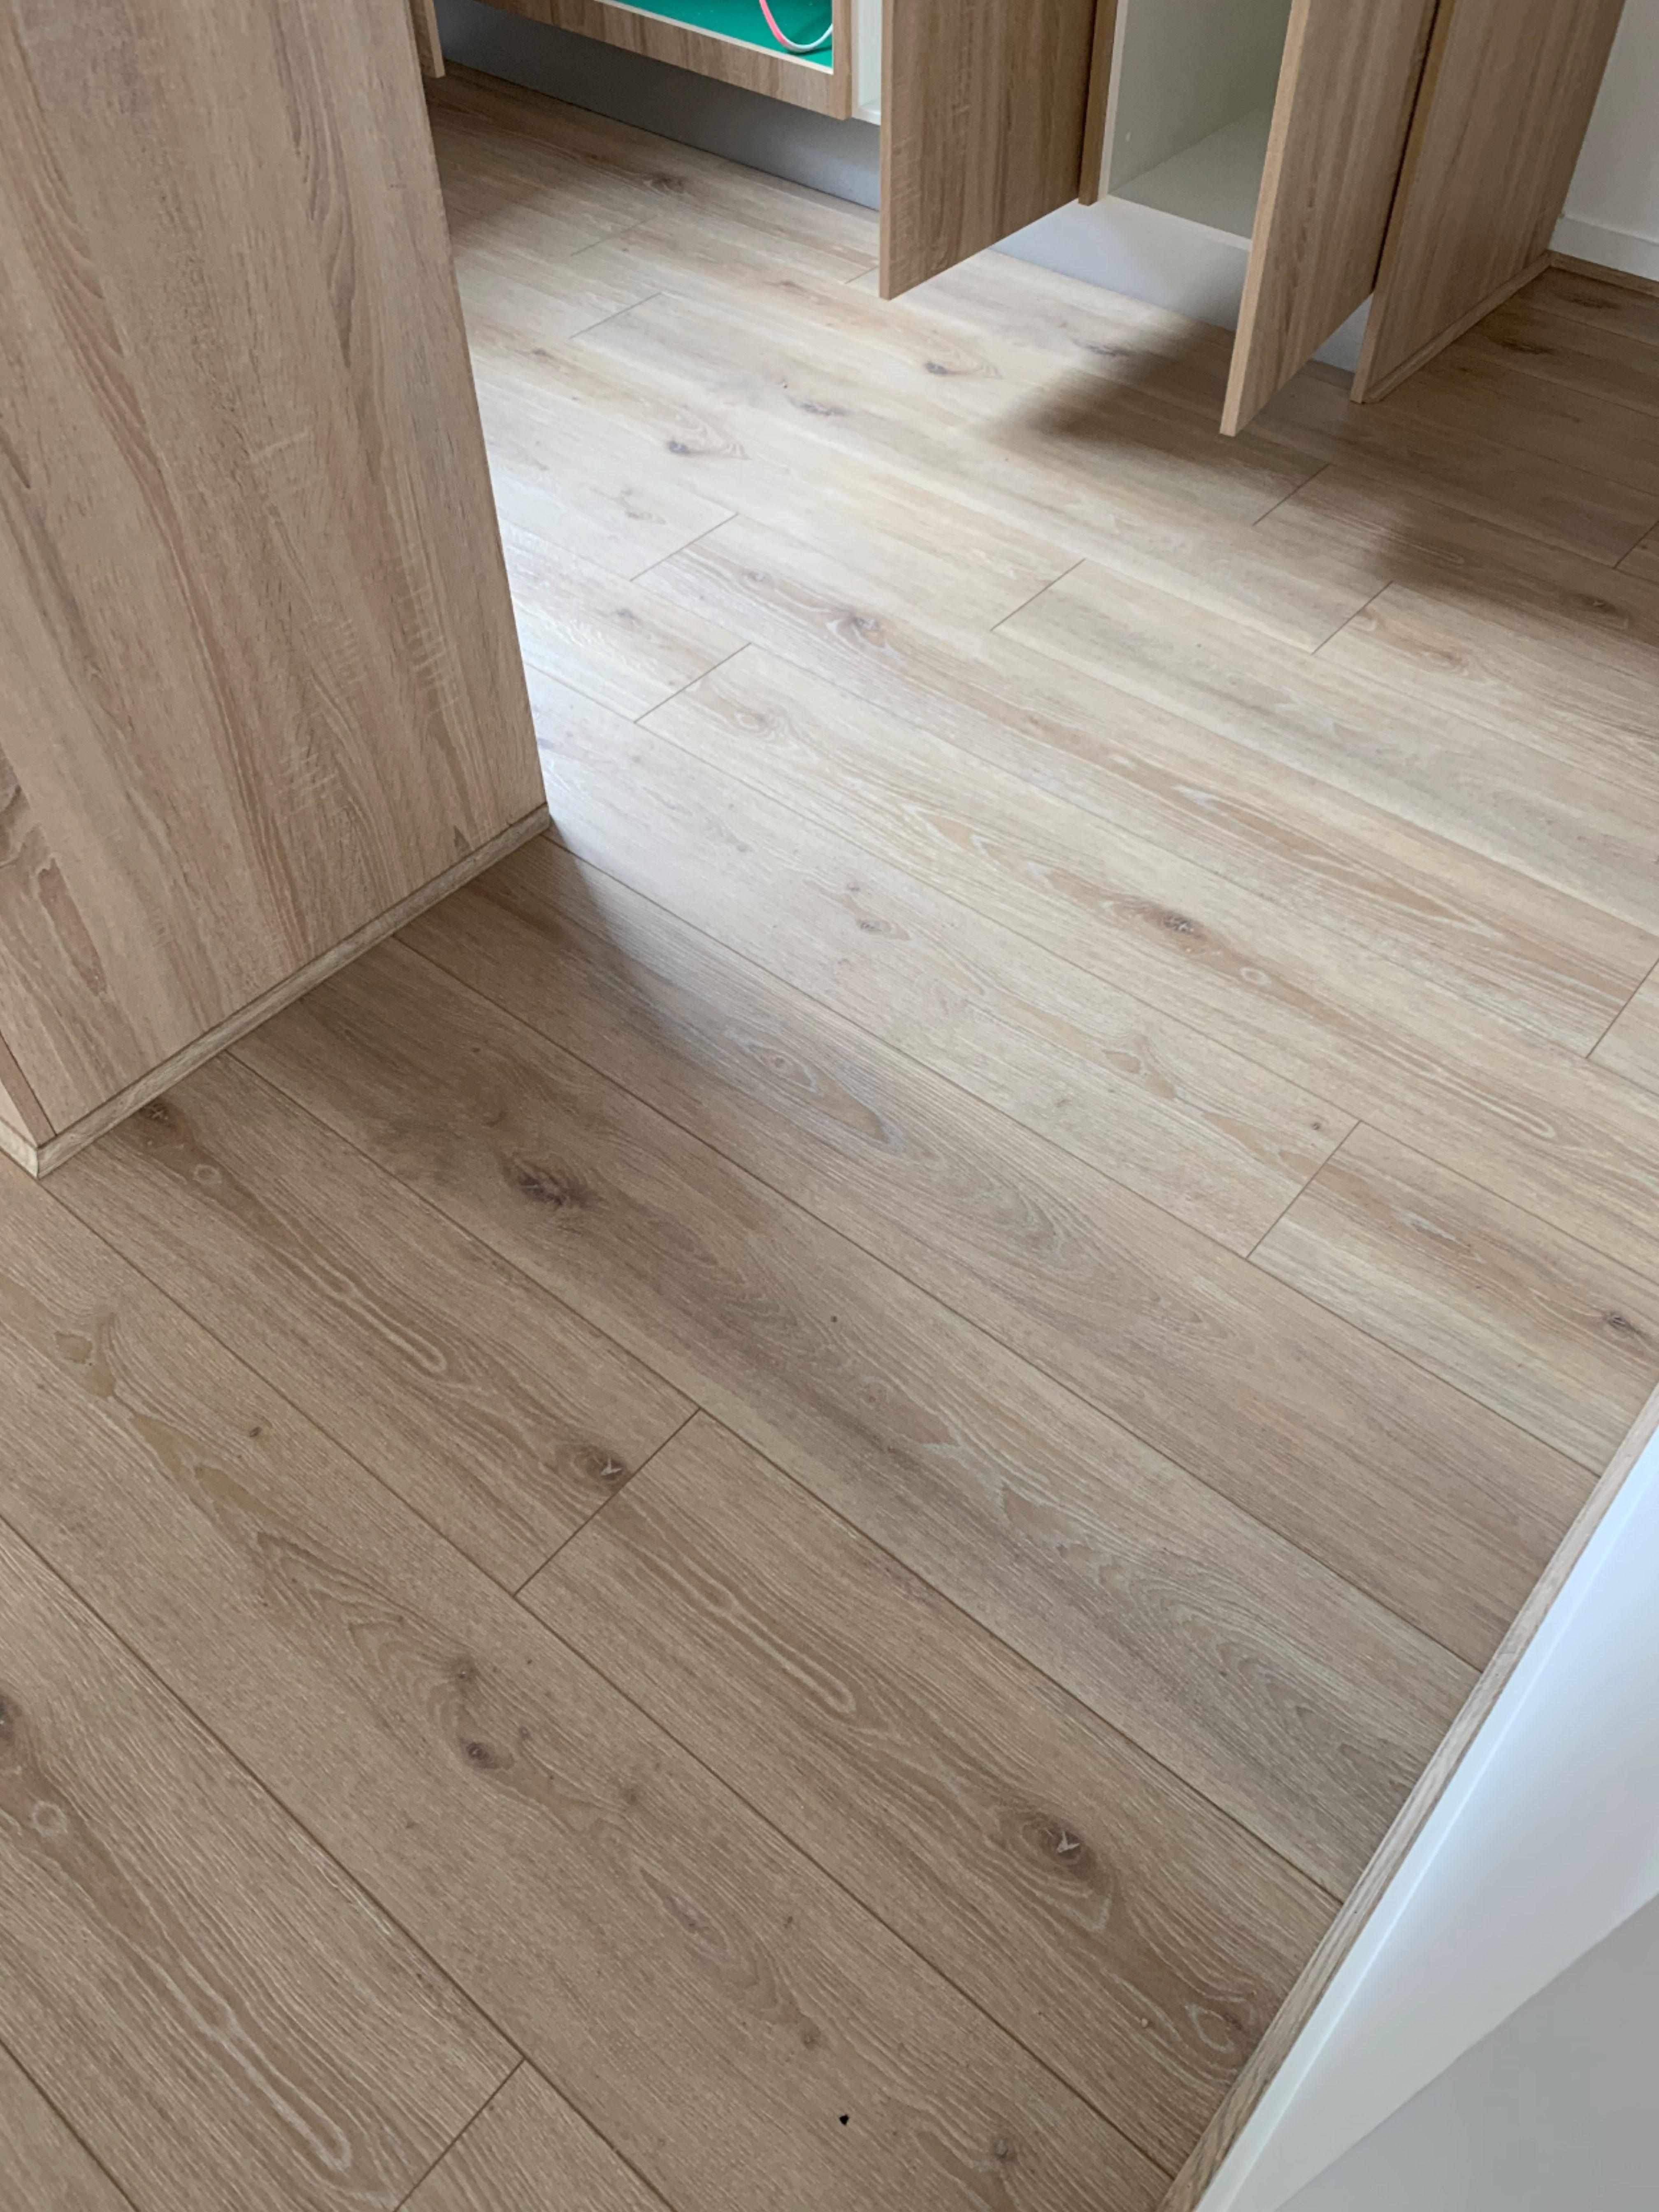 Classic Oak Timber Laminate Floors Smiling Rock Melbourne In 2020 Laminate Flooring Laminate Mohawk Laminate Flooring